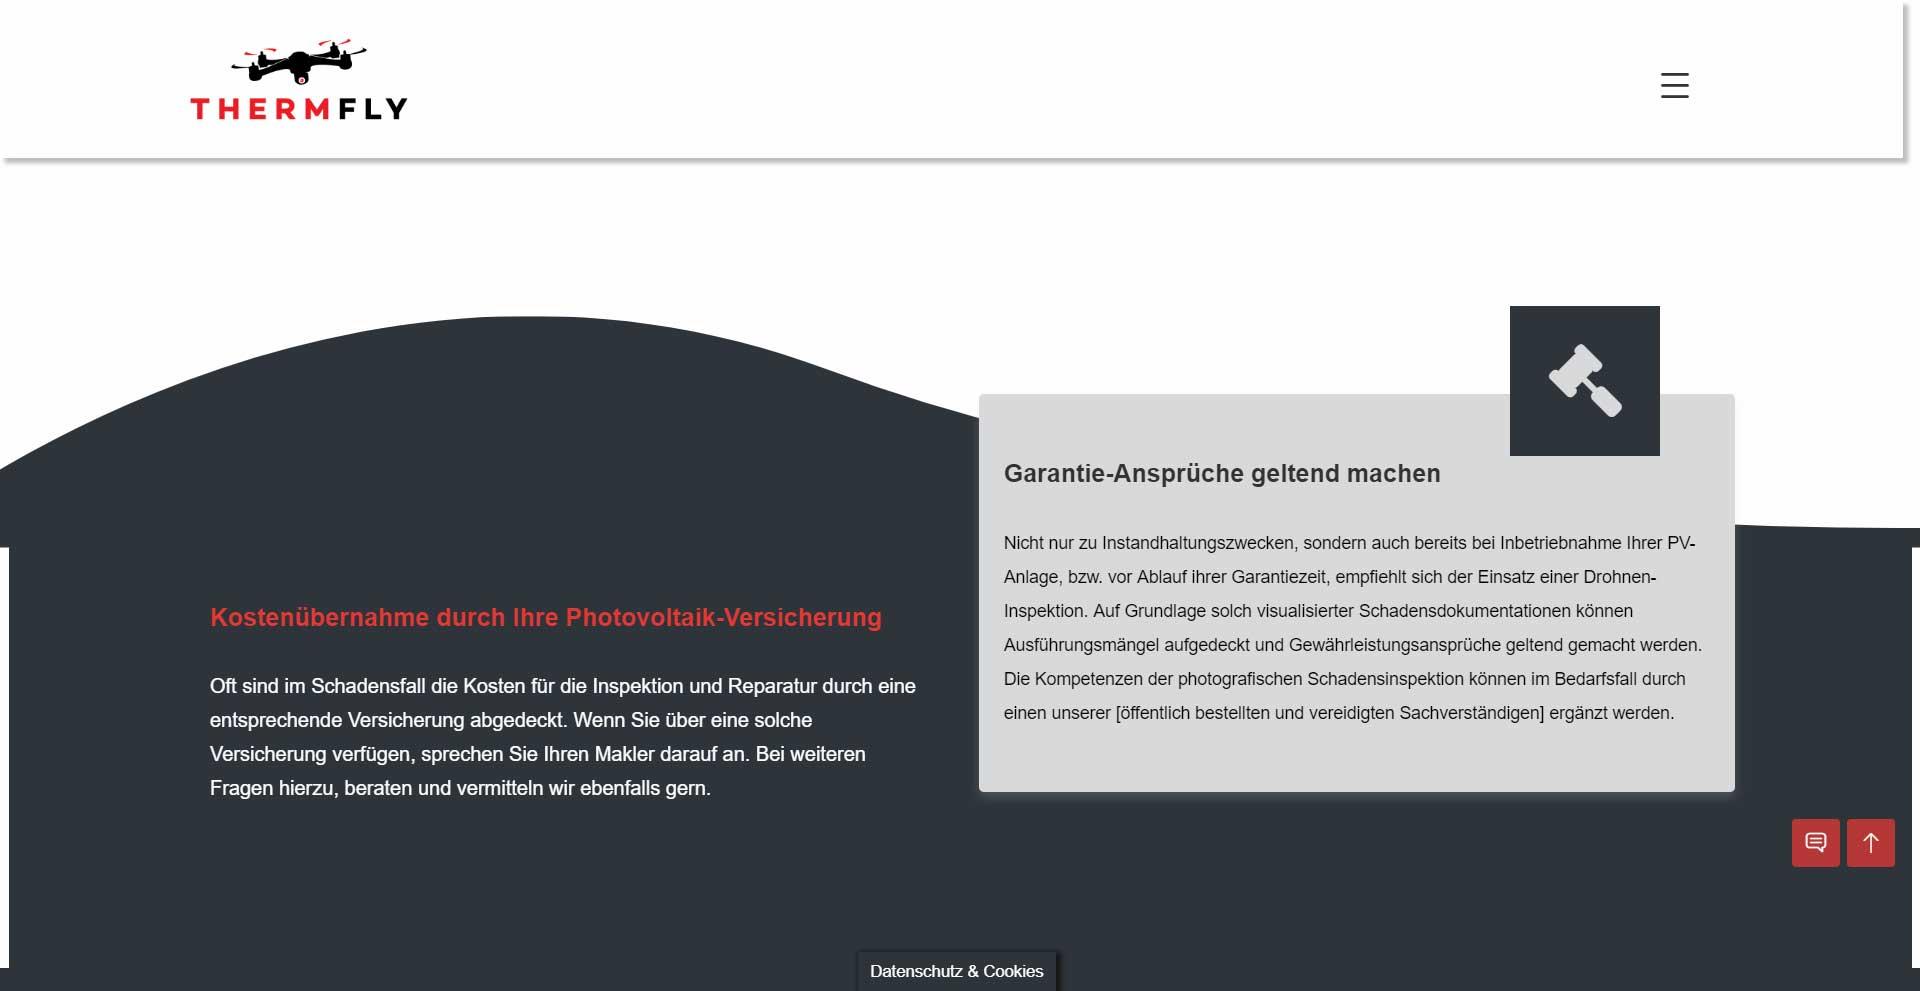 WordPress Webdesign Referenz - THERMFLY - Drohnen-Inspektion Photovoltaik